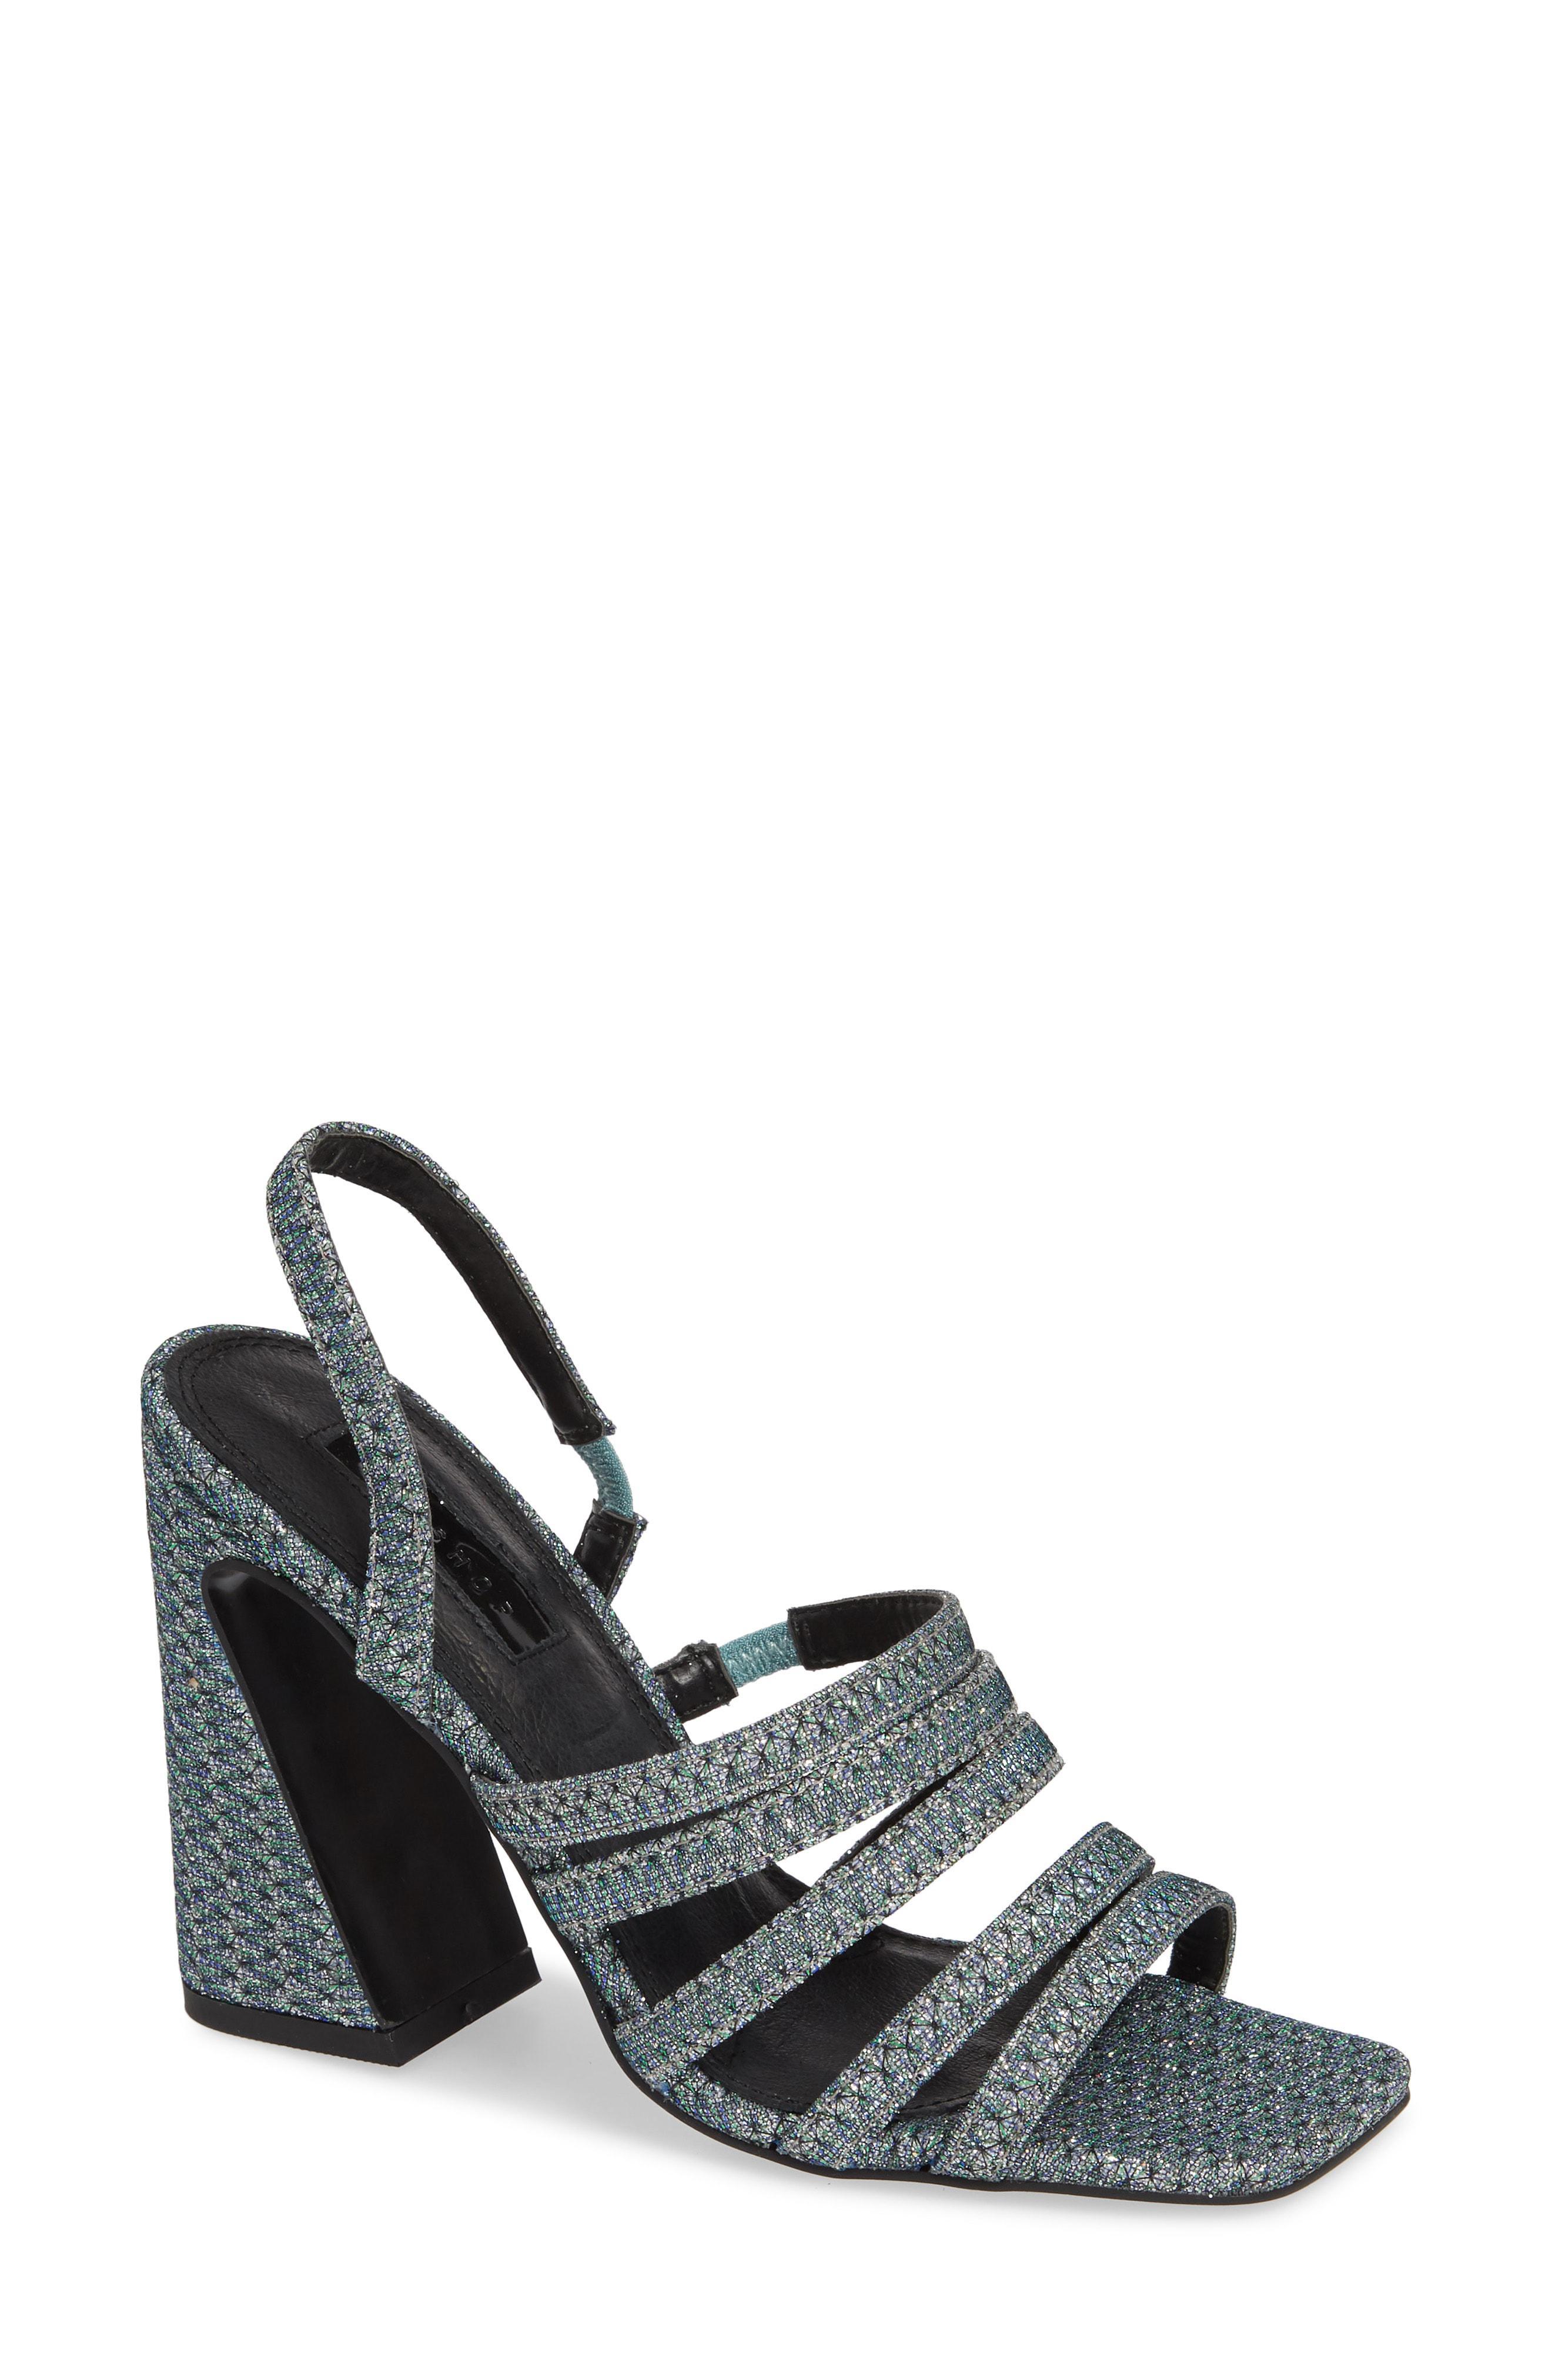 6609edcb439807 Lyst - TOPSHOP Ray Strappy Slingback Sandal in Metallic